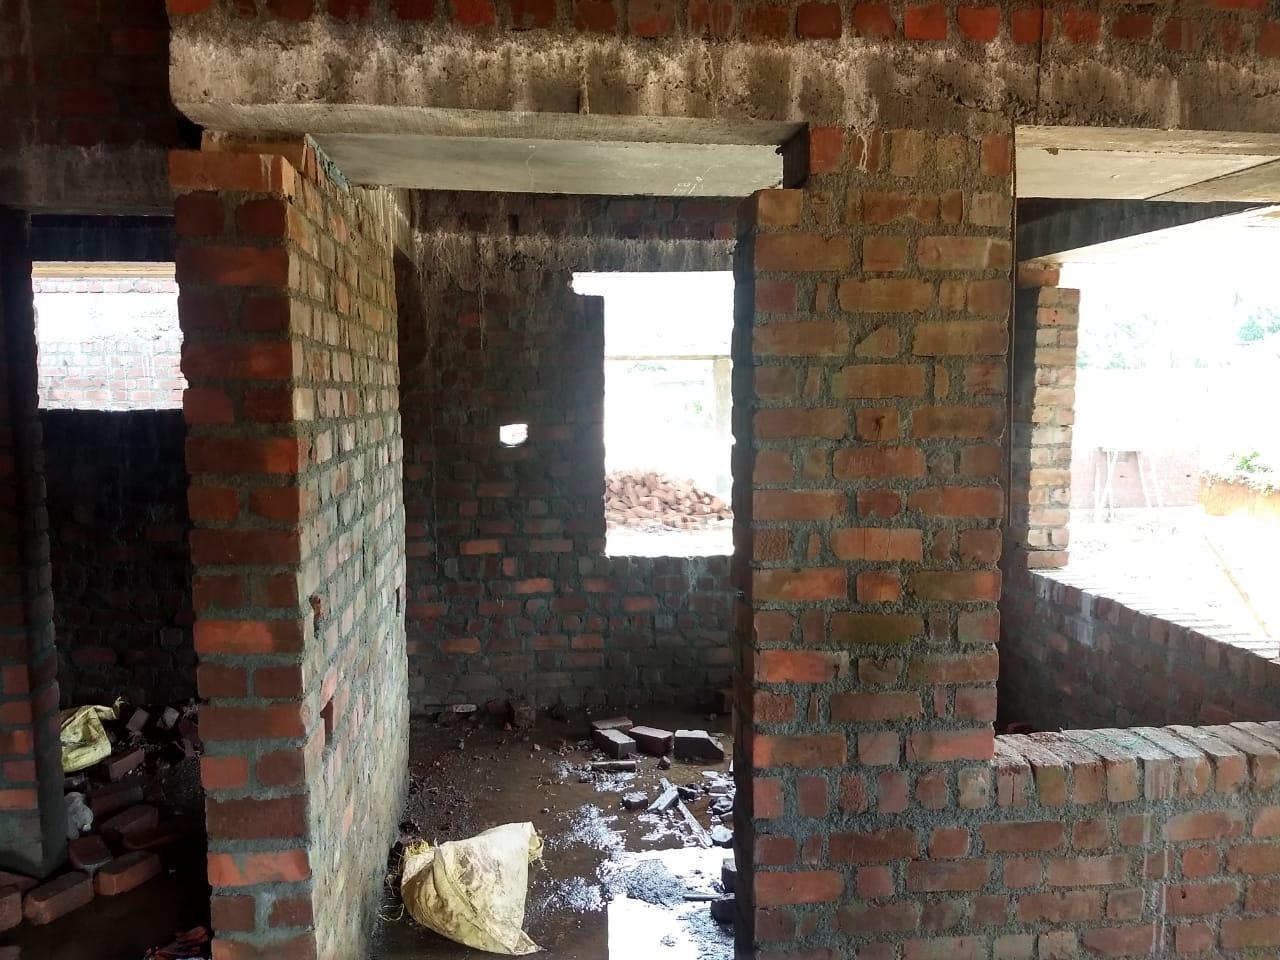 Real estate dealer - Gated Community Royal View villas for sale Palakkad, Kerala